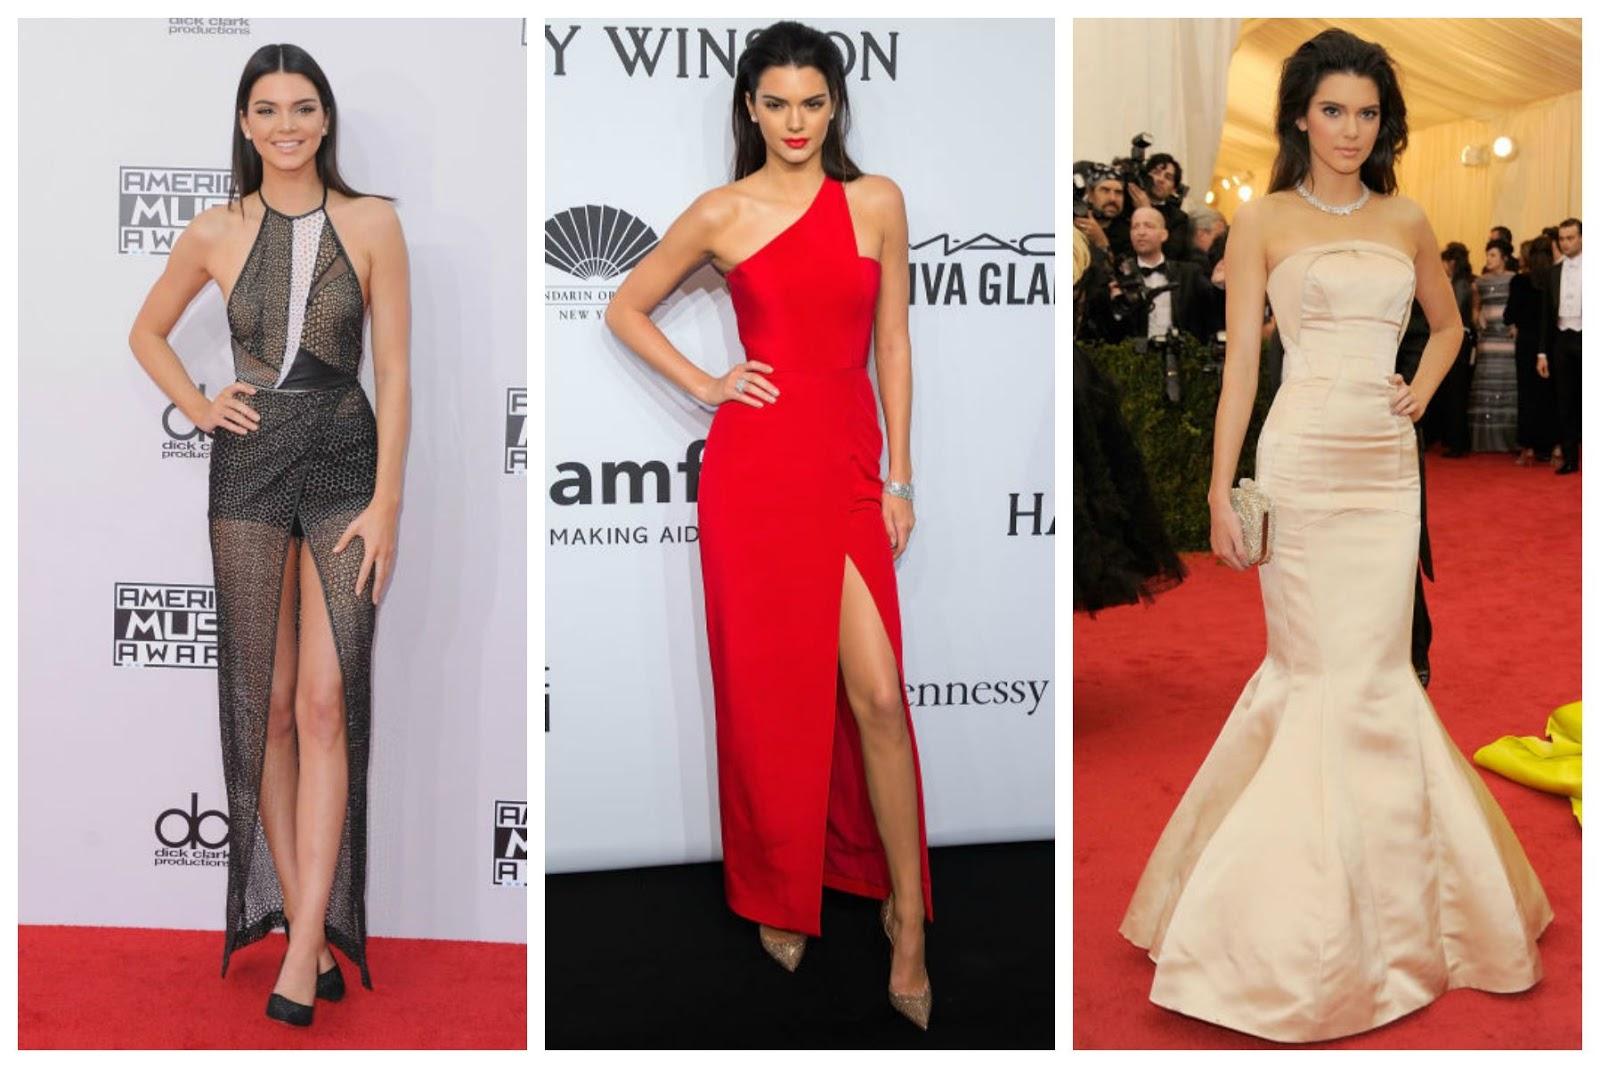 Estilo das Famosas - Kendall Jenner   Beleza em Cachos c8d4fa589b